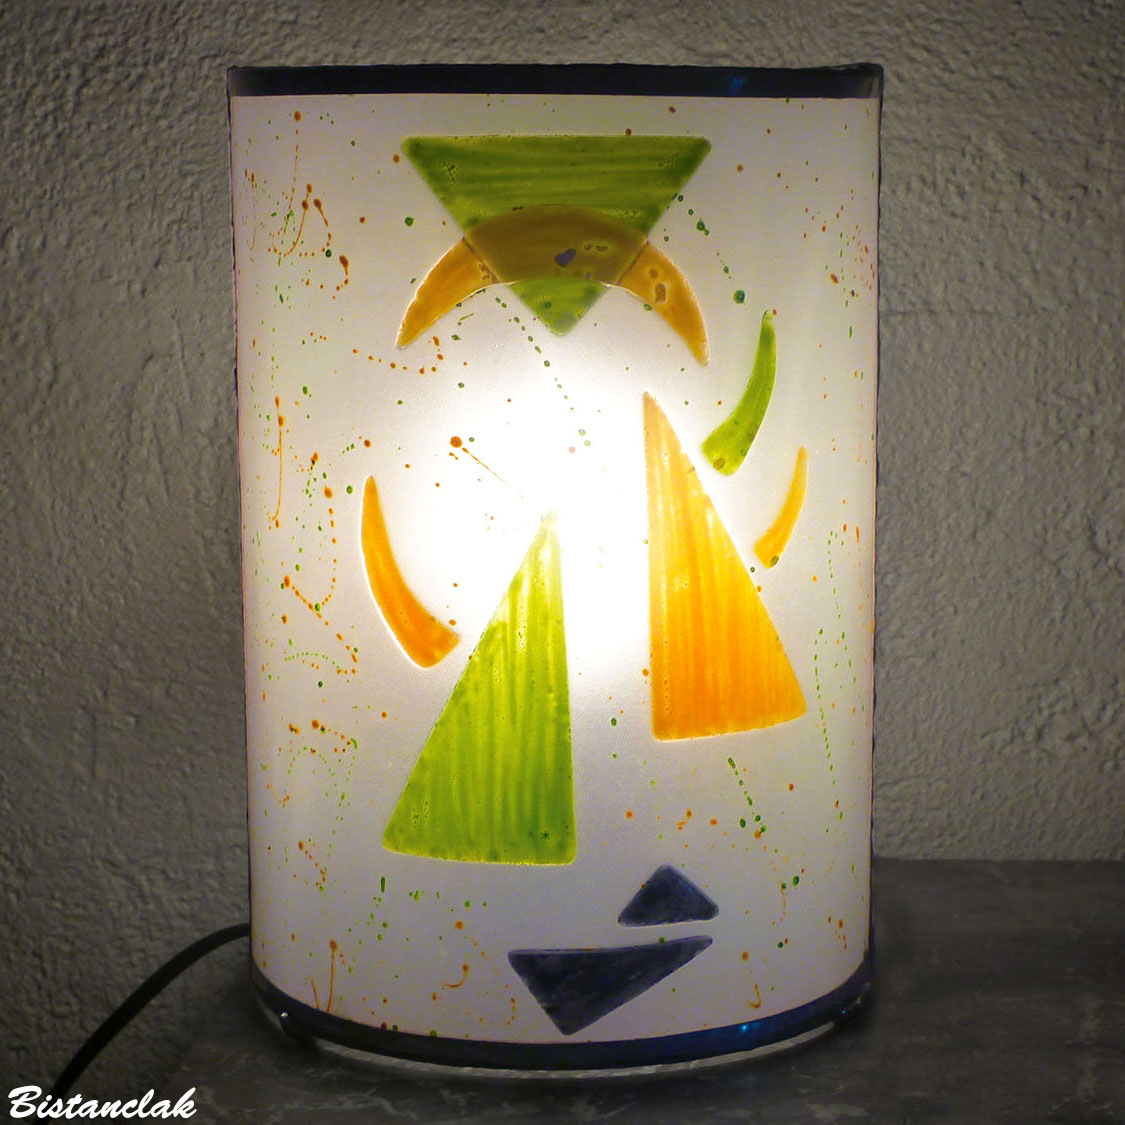 Lampe decorative au design geometrique motif triangle orange et vert